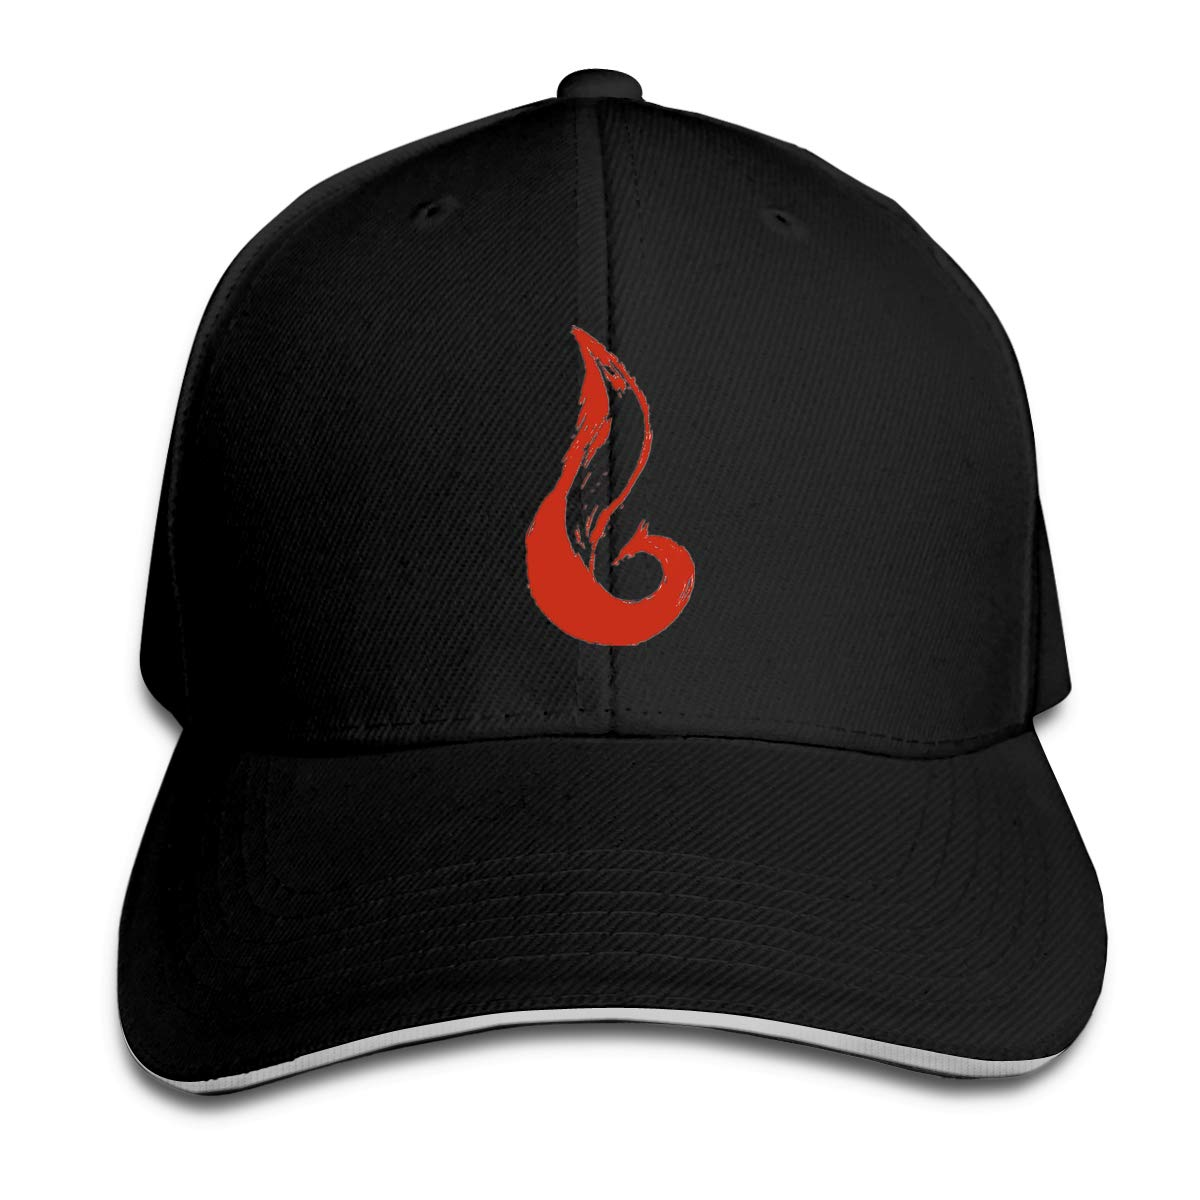 Fox Classic Adjustable Cotton Baseball Caps Trucker Driver Hat Outdoor Cap Black